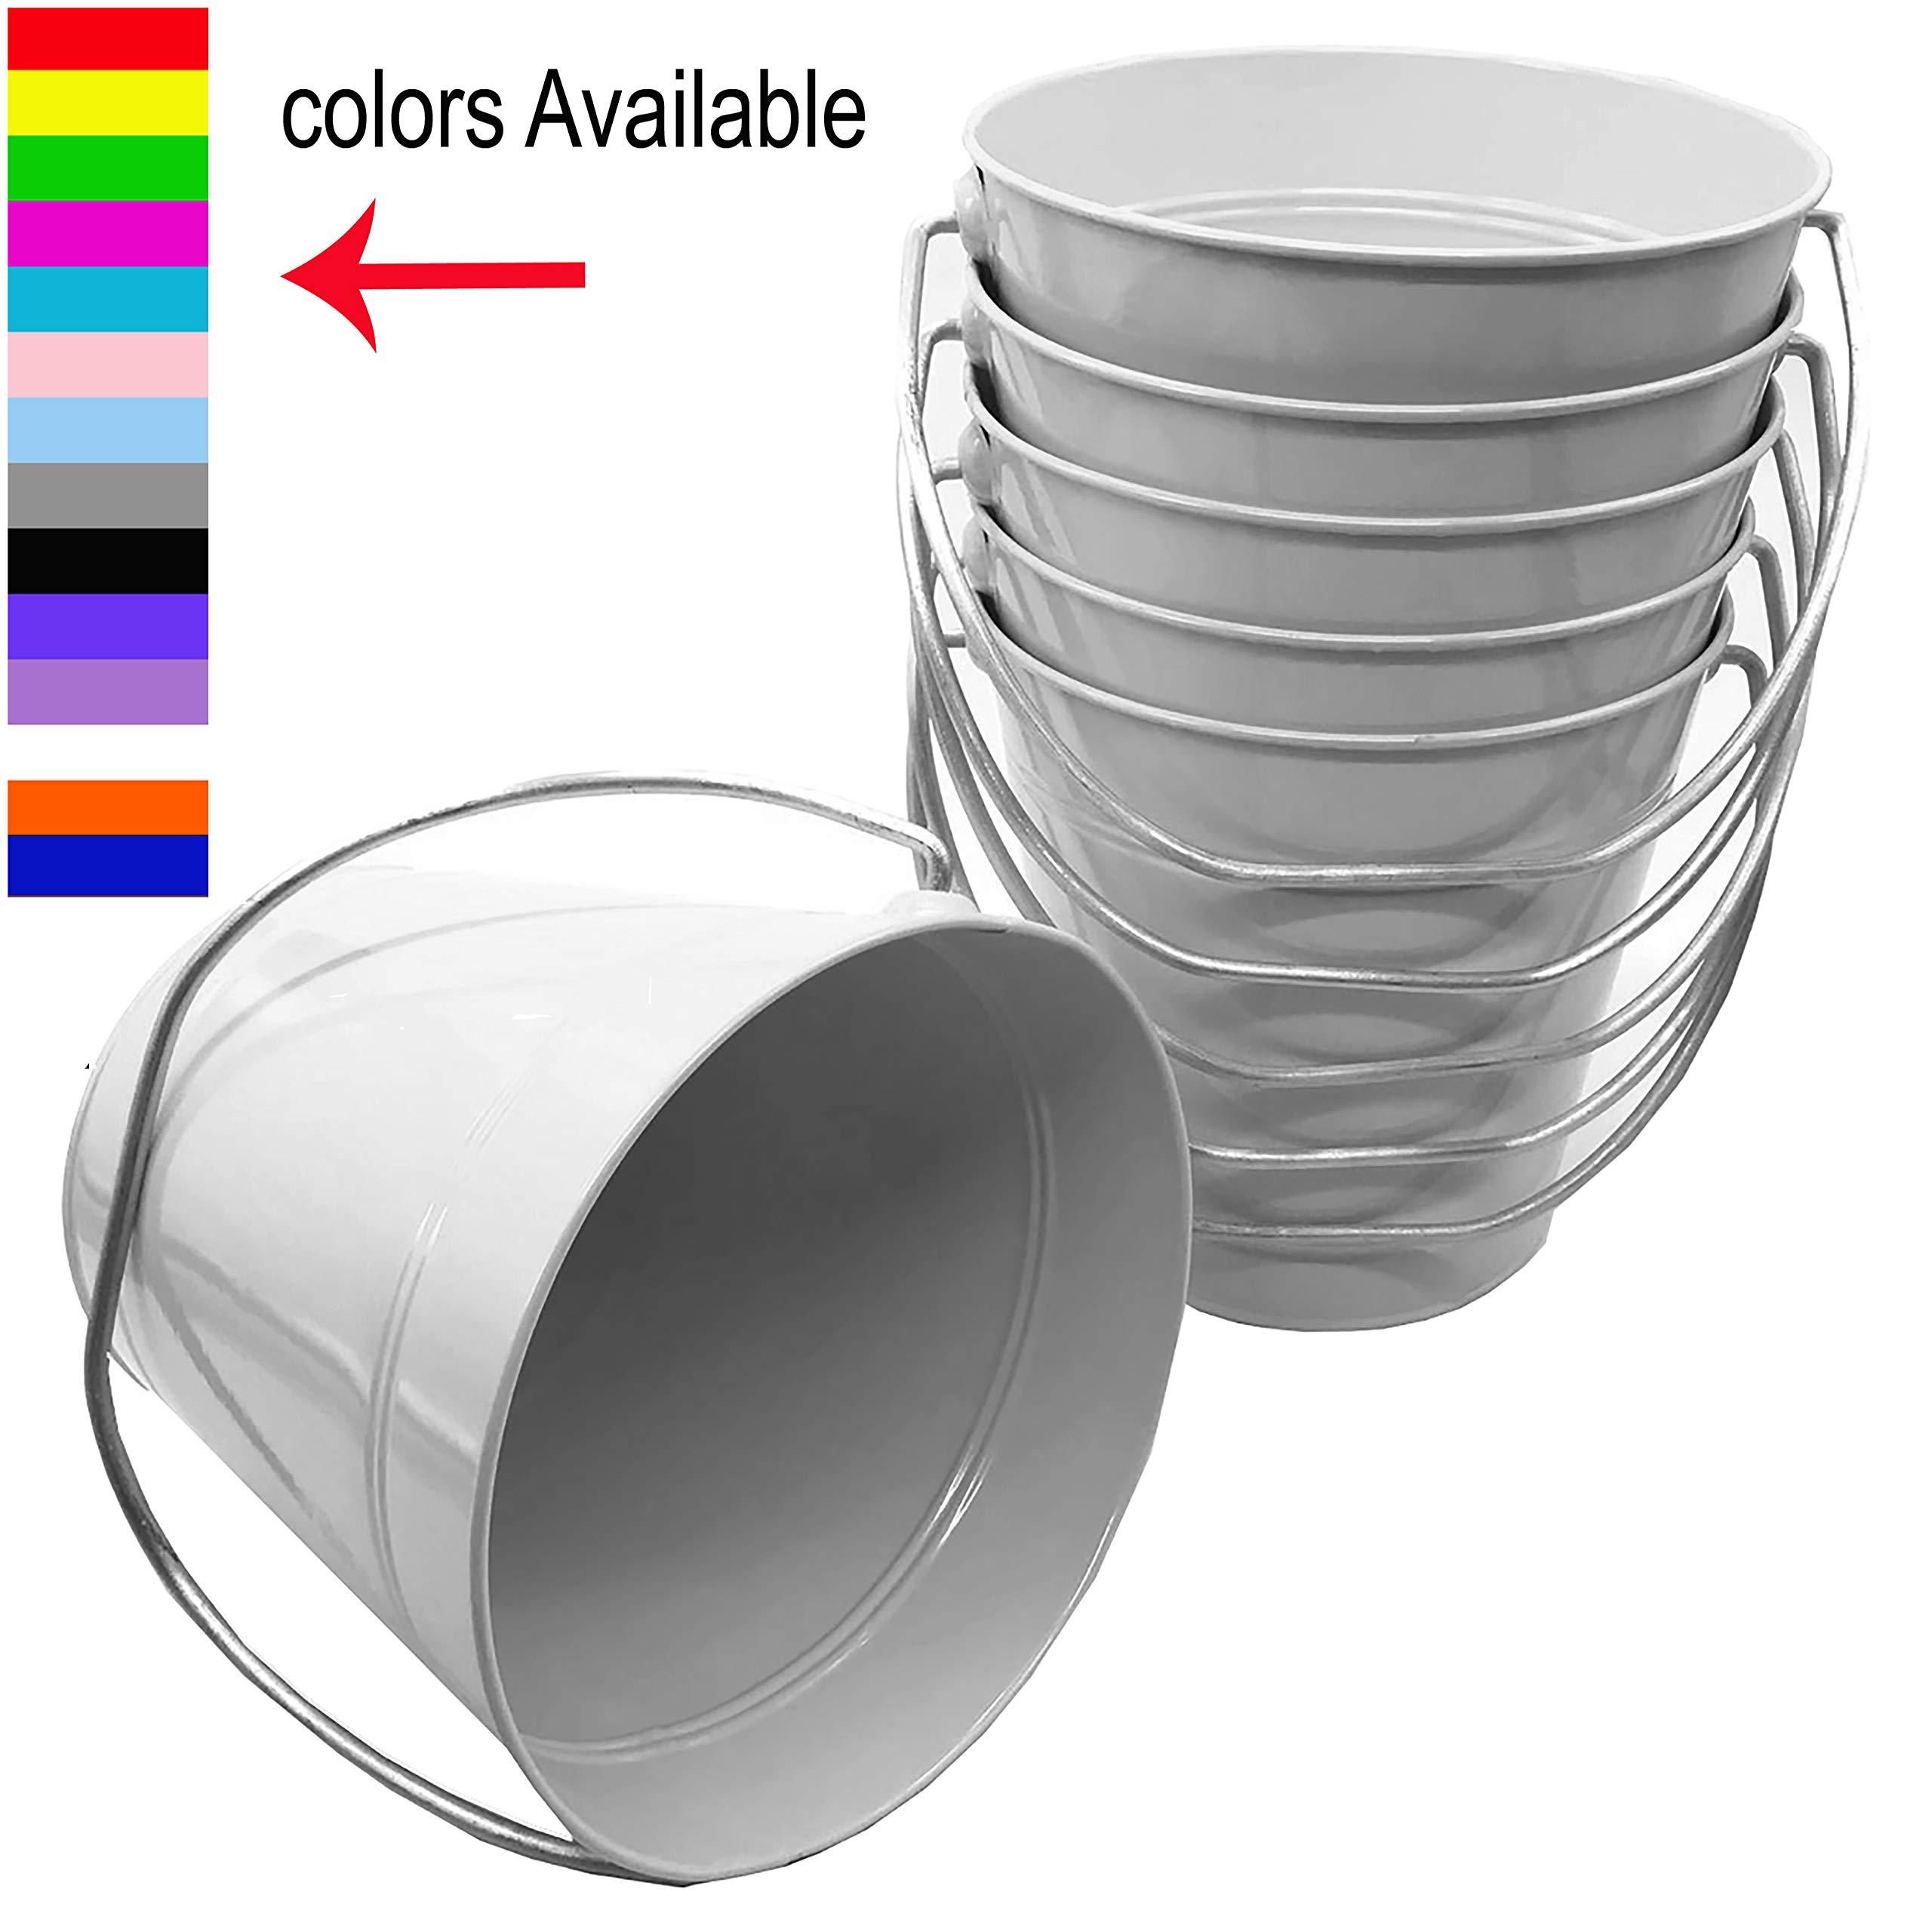 Italia Metal Bucket 3.7 Quart color White Size 7.5 x 7.5'' 6-Pack by ITALIA